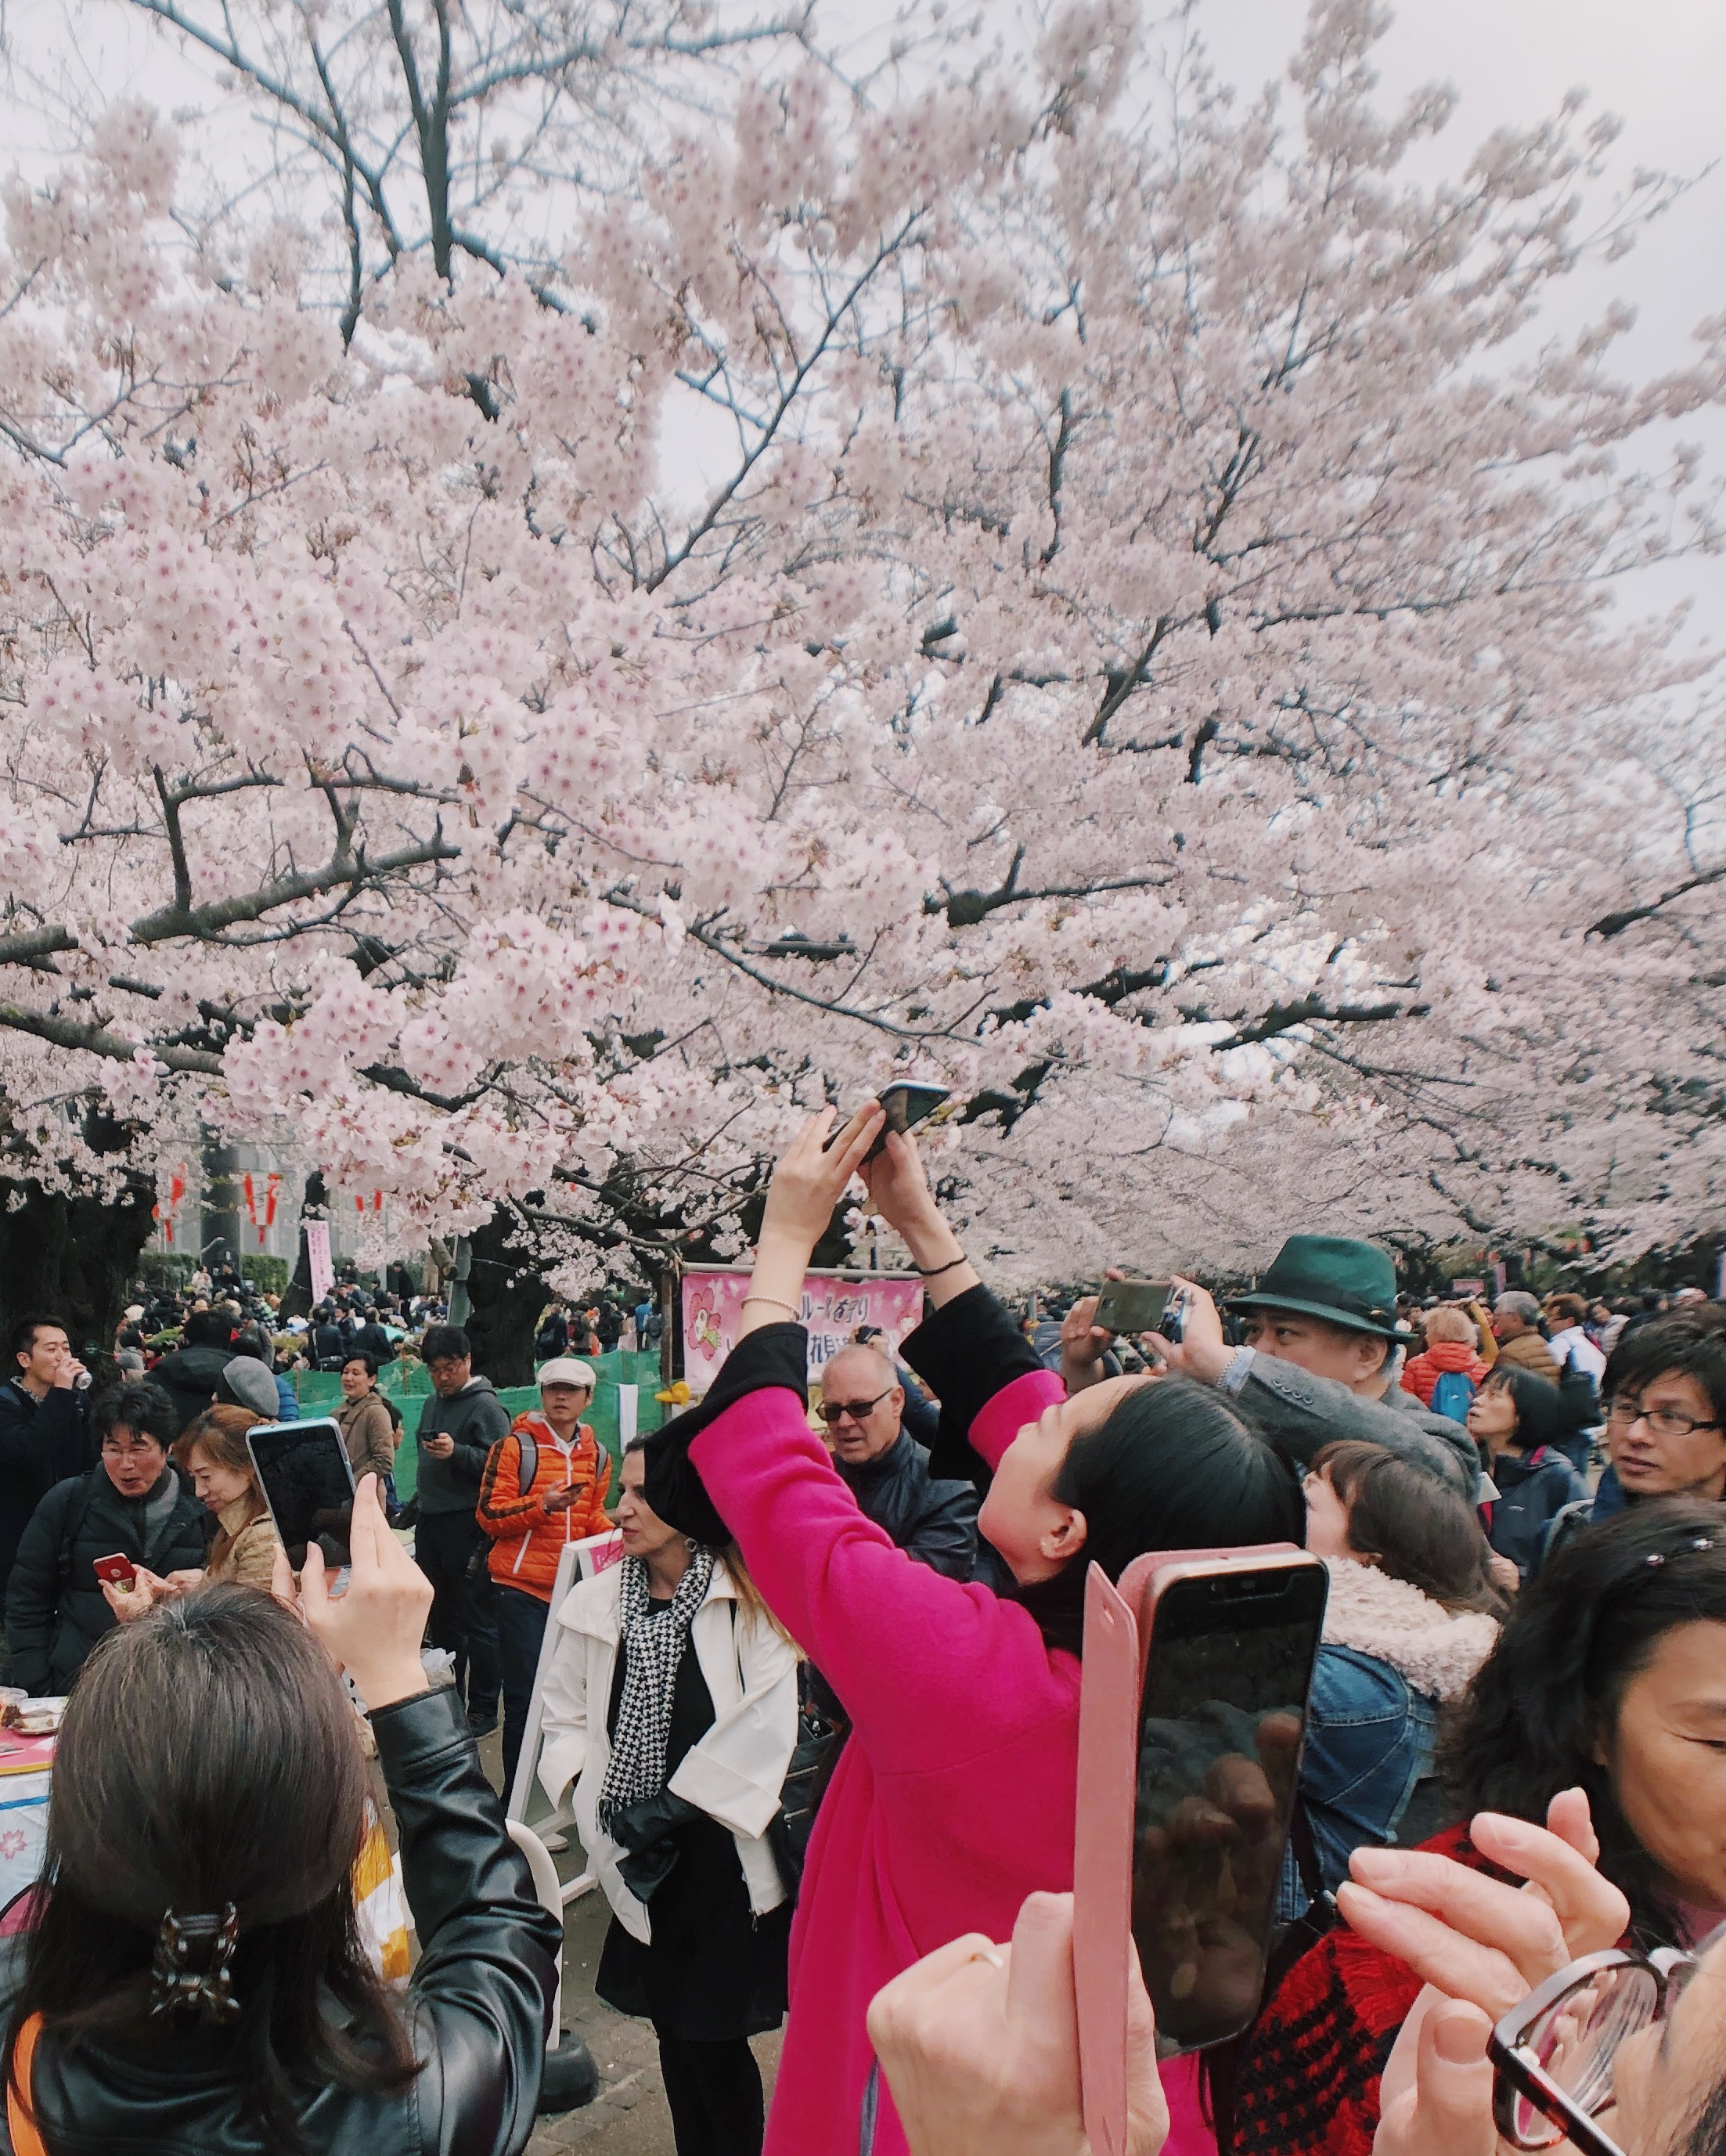 Rush to Sakura, Ueno Park.